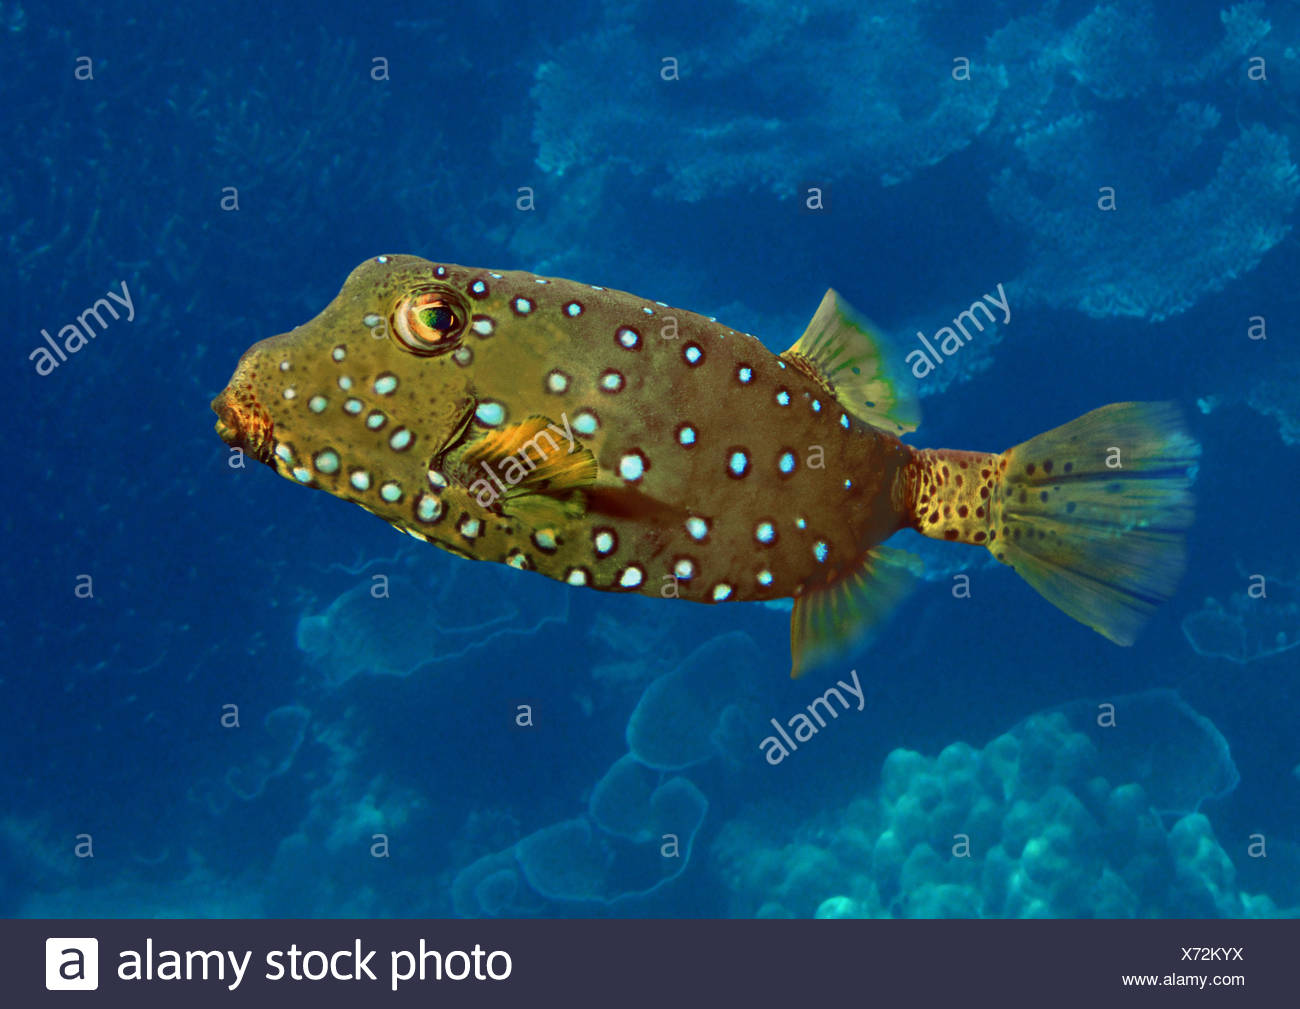 blue-spotted boxfish, yellow boxfish, polka dot boxfish (Ostracion cubicus, Ostracion tuberculatus), distribution: Indopacific - Stock Image